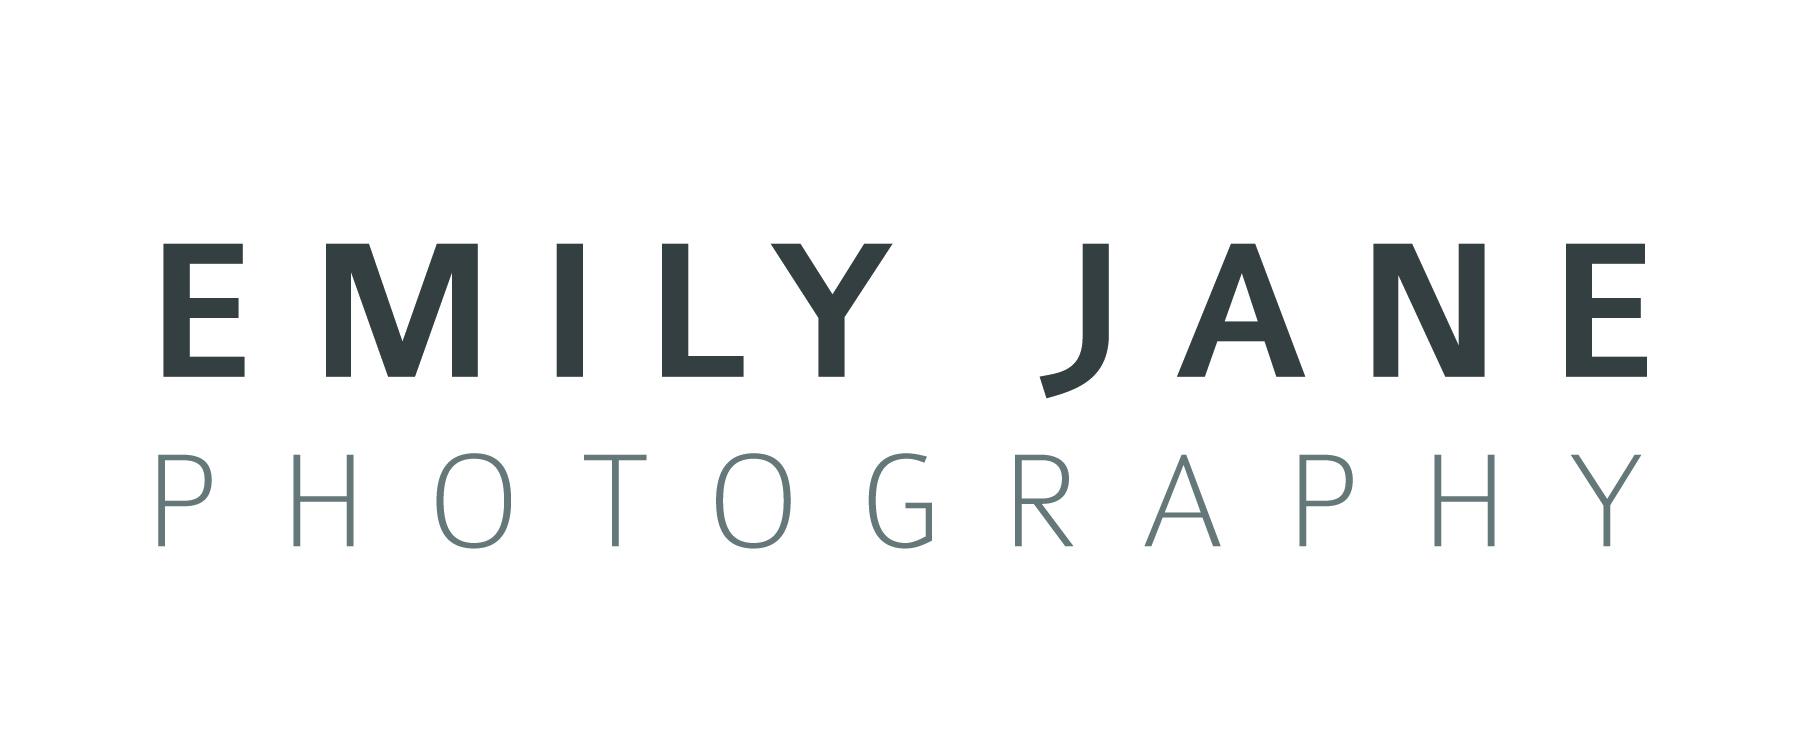 emily-jane-logo-3-type.jpg